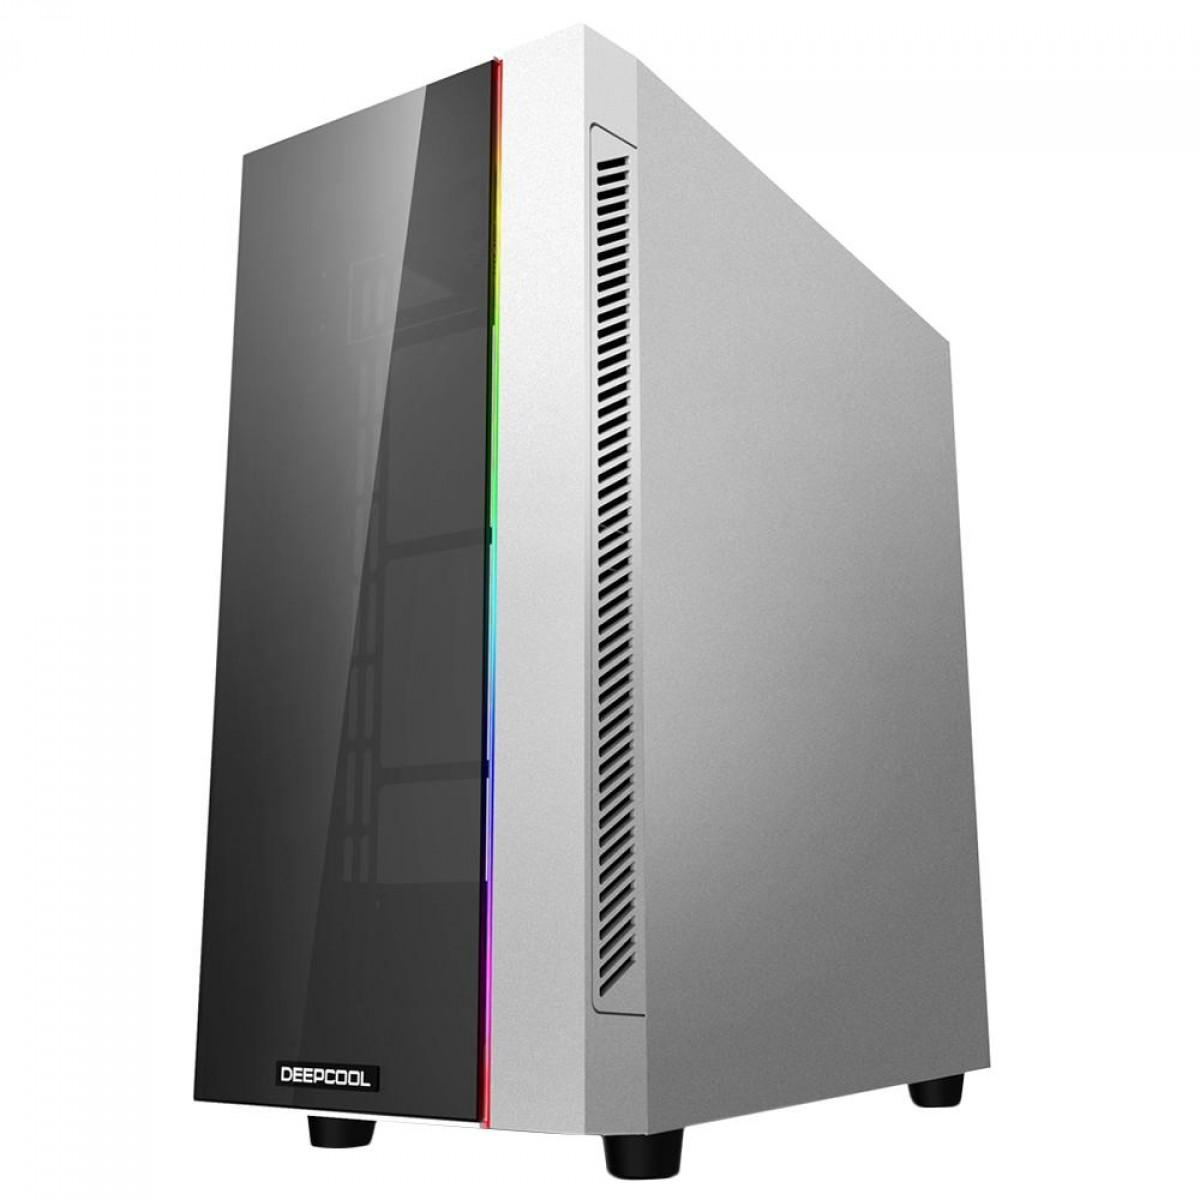 Gabinete Gamer DeepCool Matrexx 55 V3, ARGB, Mid Tower, Vidro Temperado, White, Sem Fonte, Sem Fan, DP-ATX-MATREXX55-AR-WH